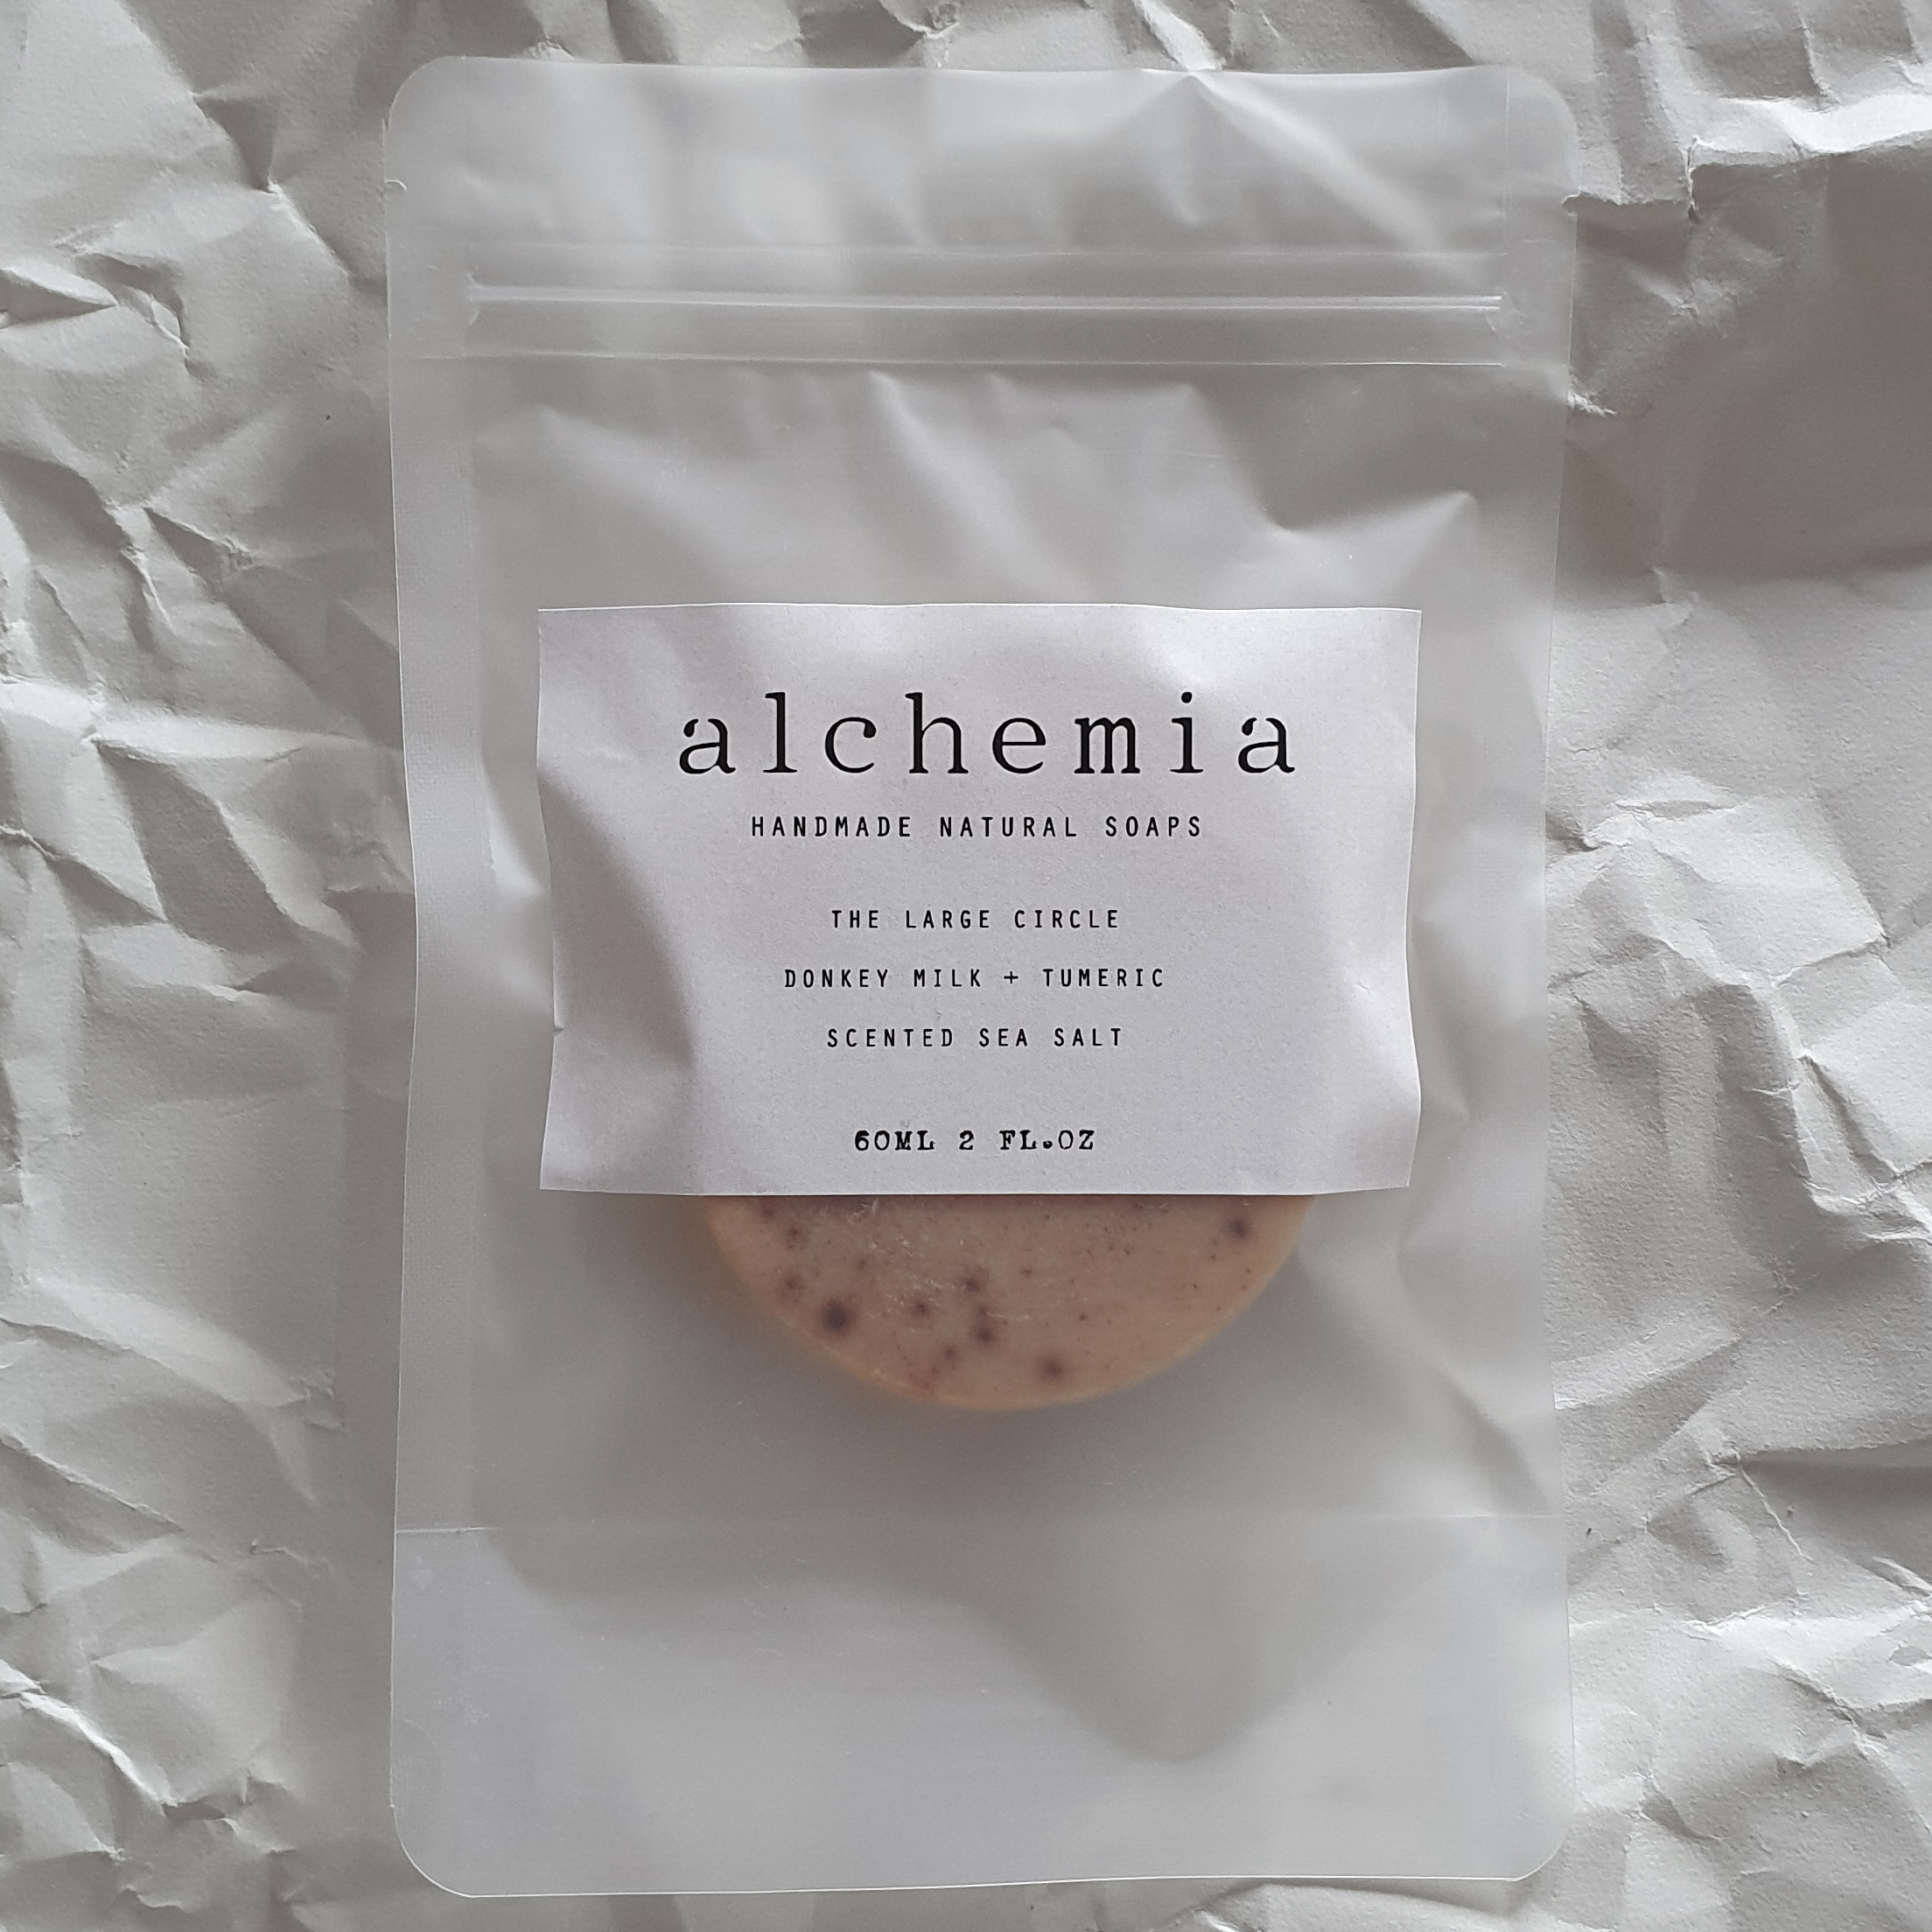 Alchemia Handmade Self-Care Rituals